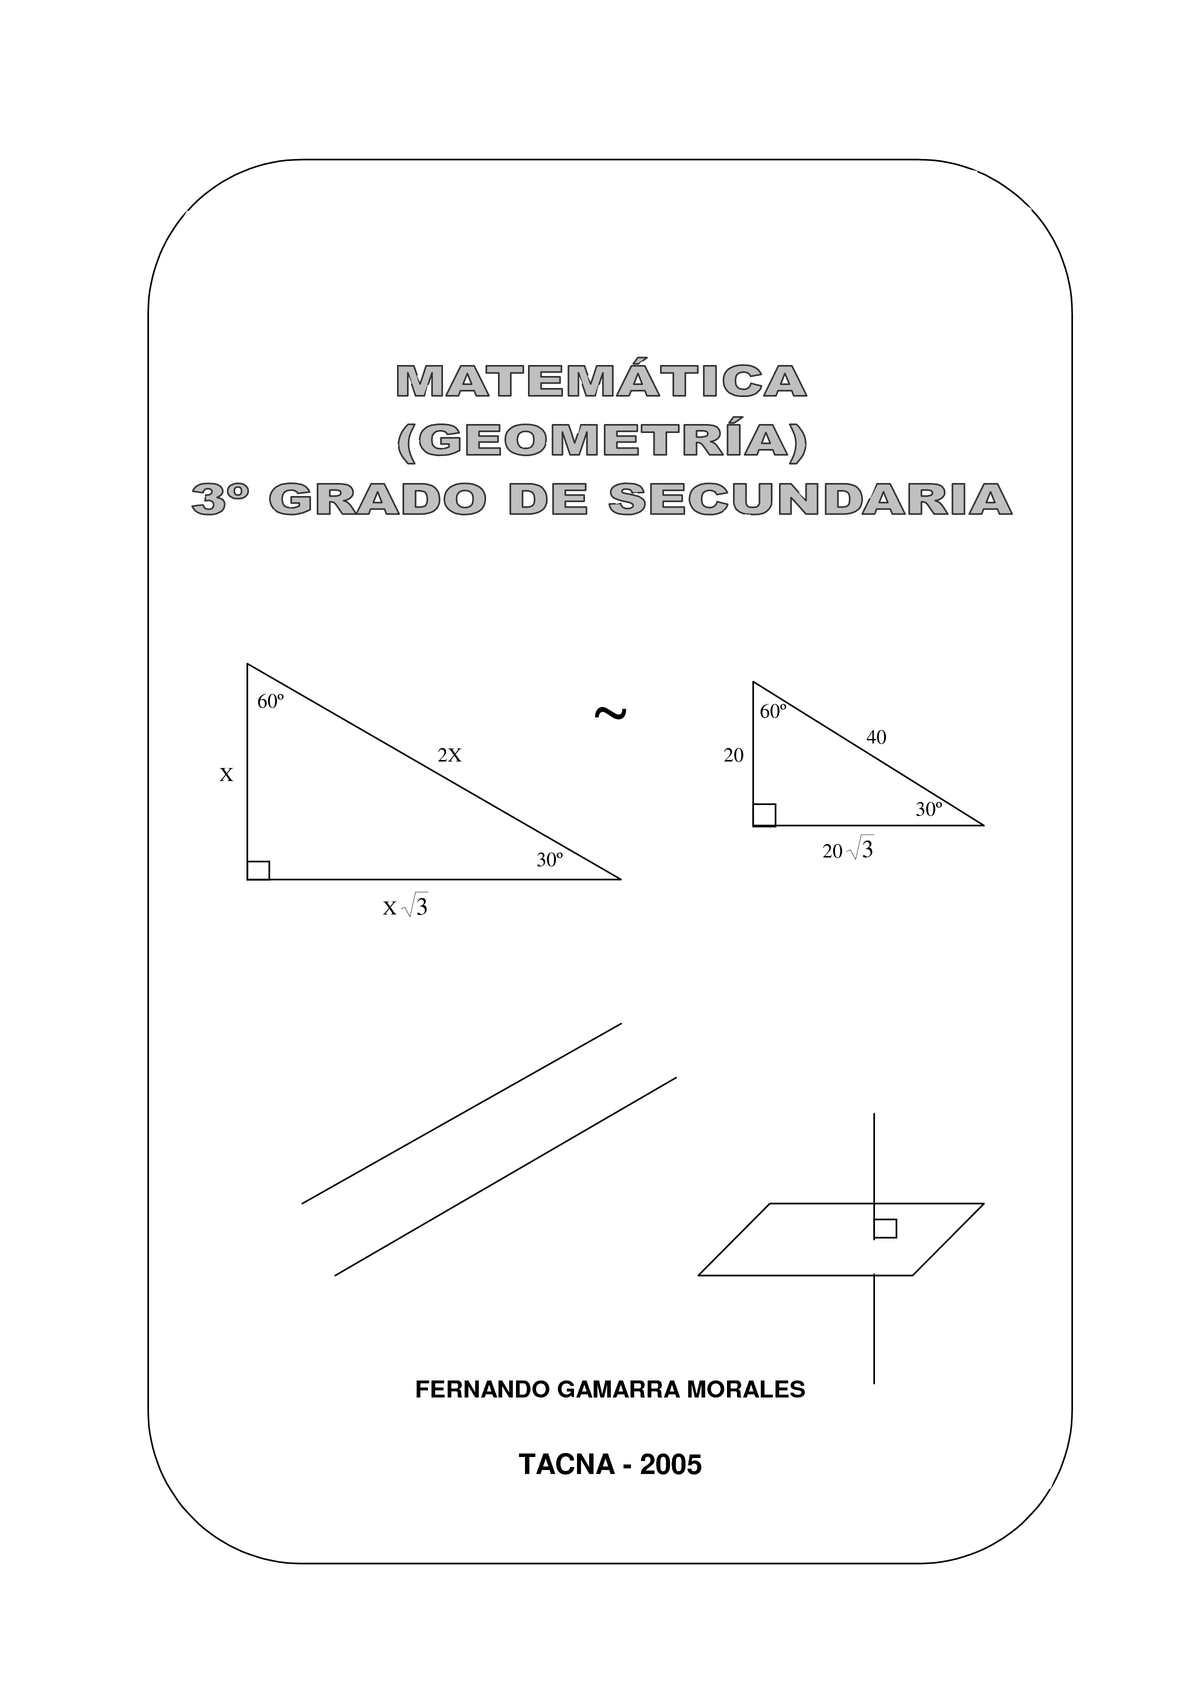 Geometría (3º grado de secundaria)